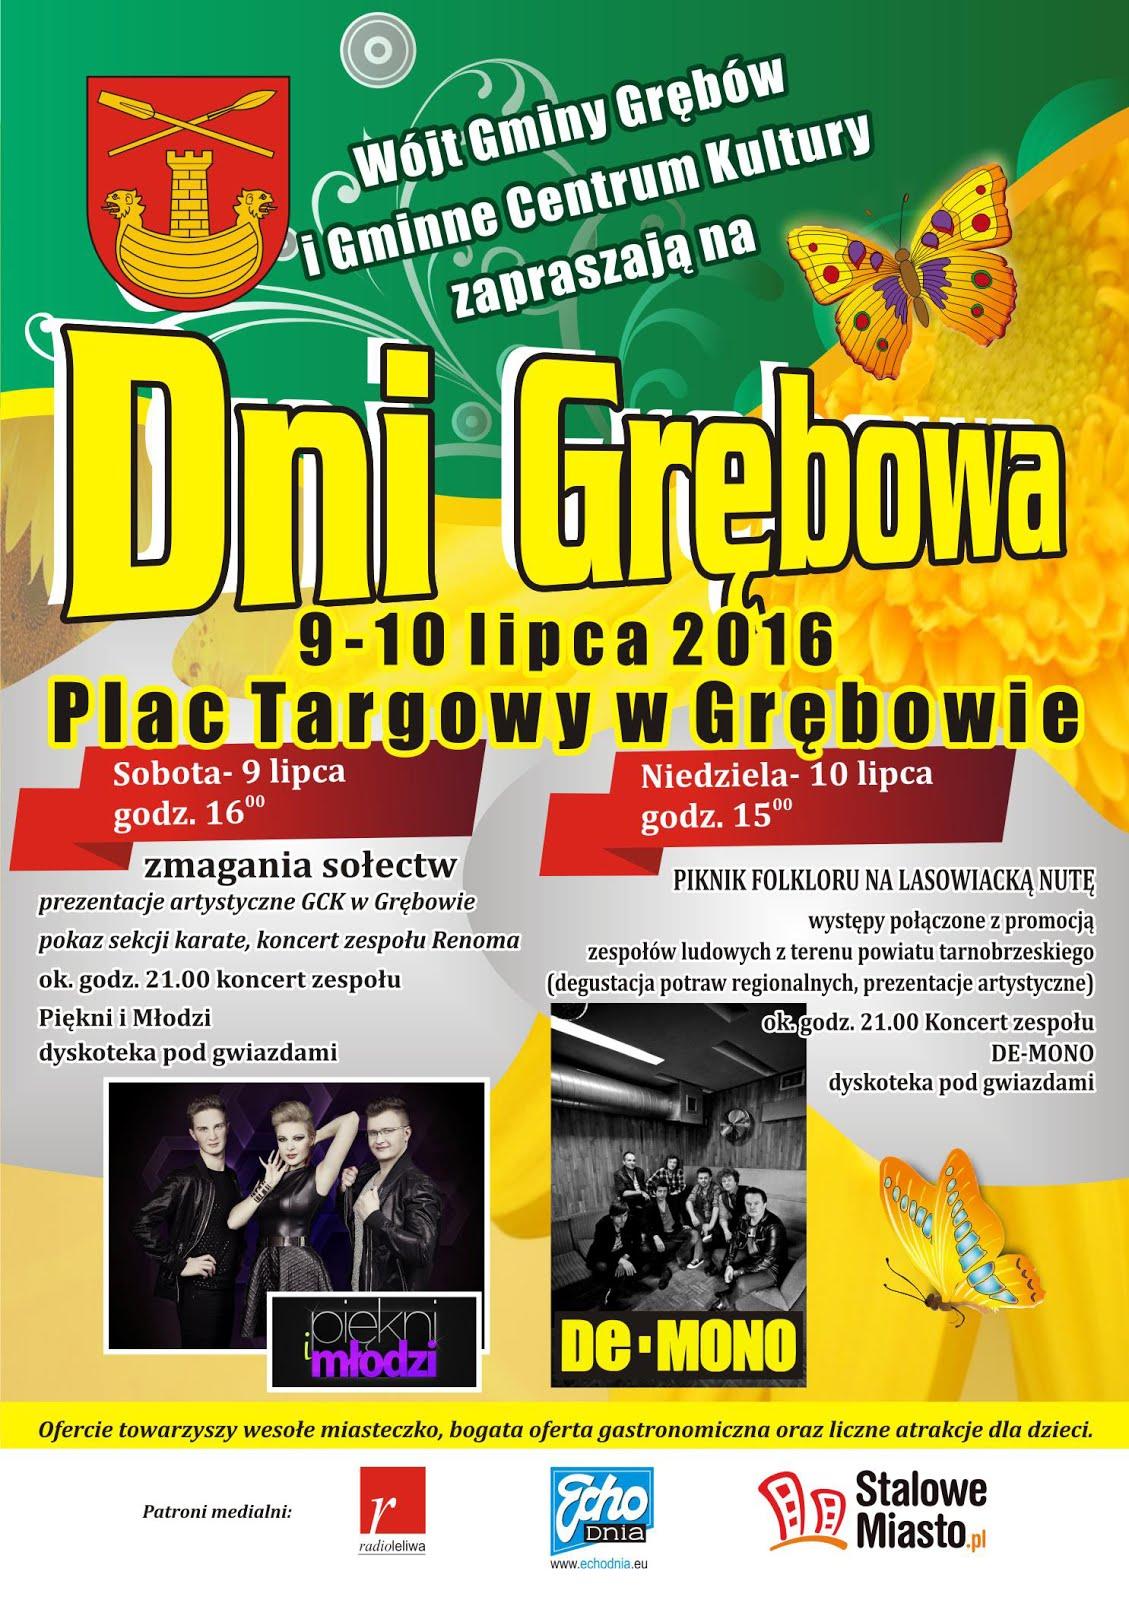 Dni Grębowa 2016